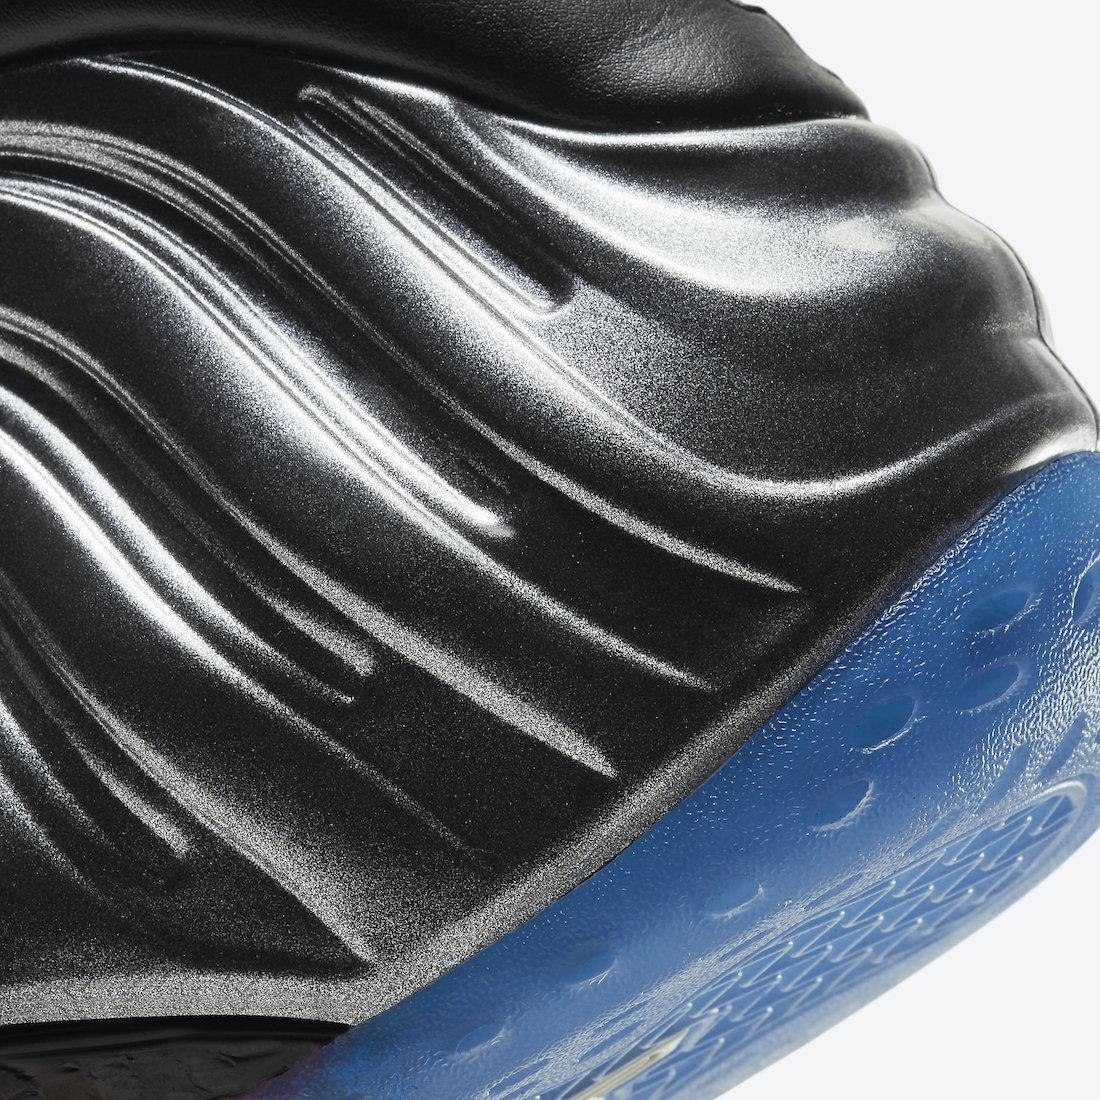 Nike-Air-Foamposite-One-Gradient-Soles-CU8063-001-Release-Date-7